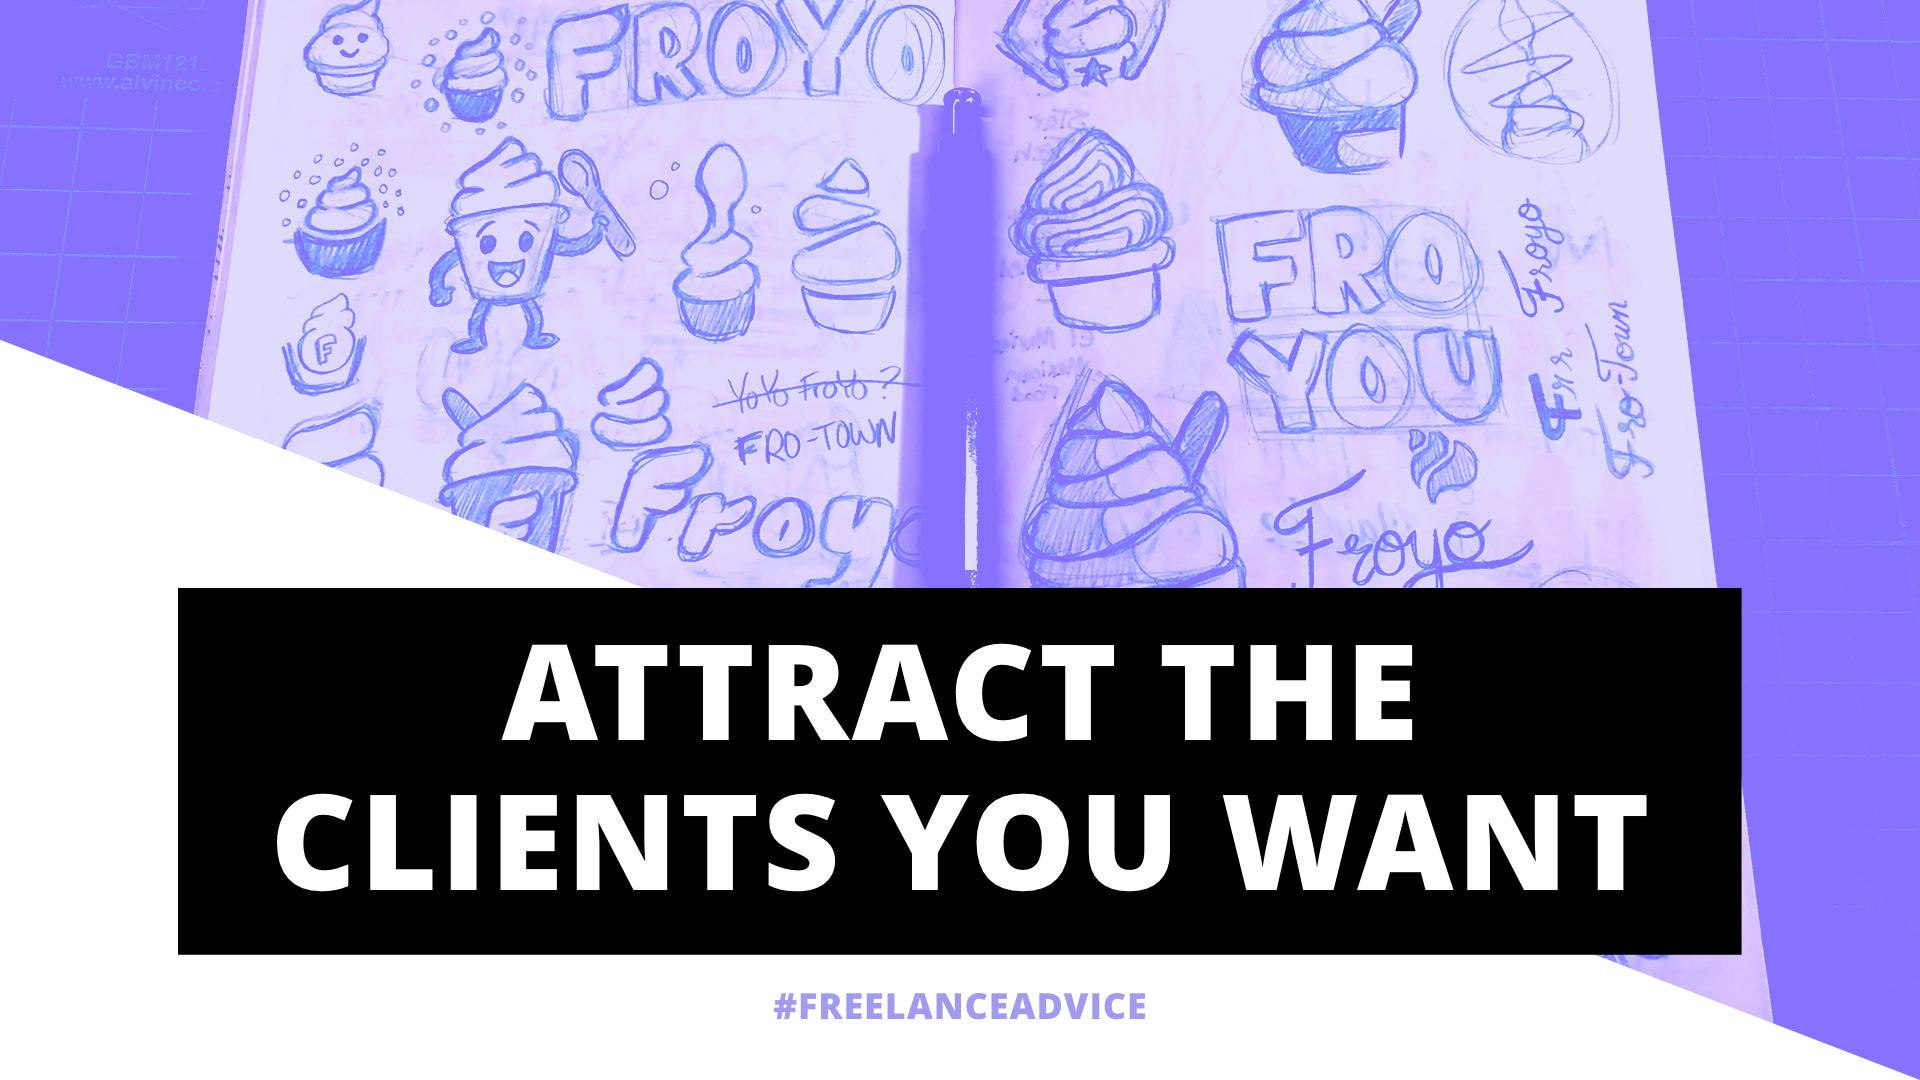 RockyRoark_Freelance-Advice_01_Header.png